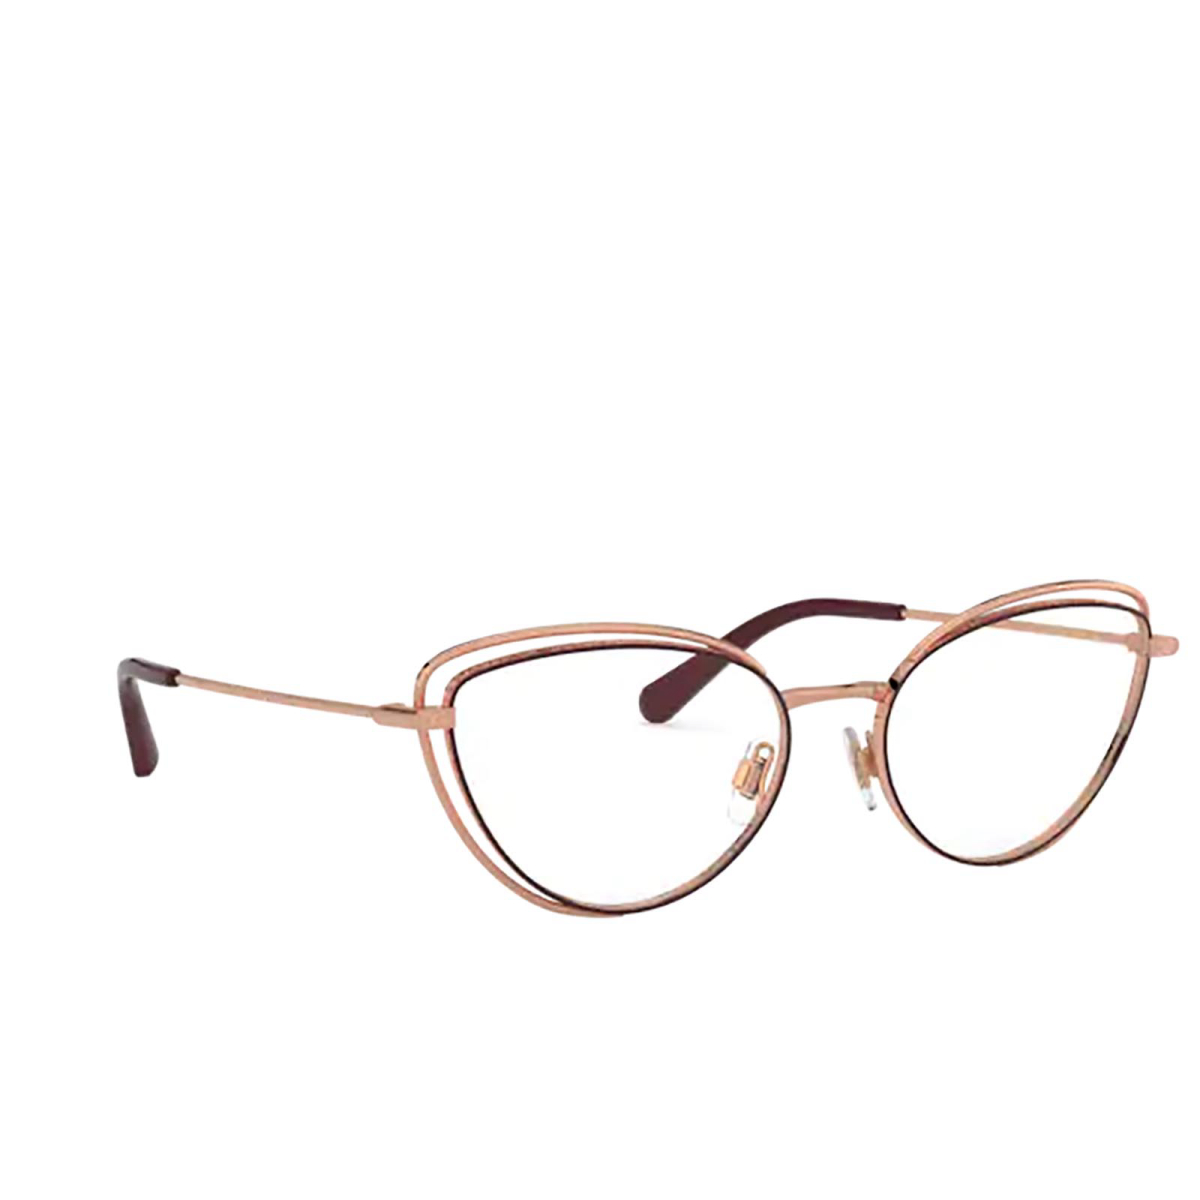 Dolce & Gabbana® Cat-eye Eyeglasses: DG1326 color Pink Gold / Bordeaux 1333.